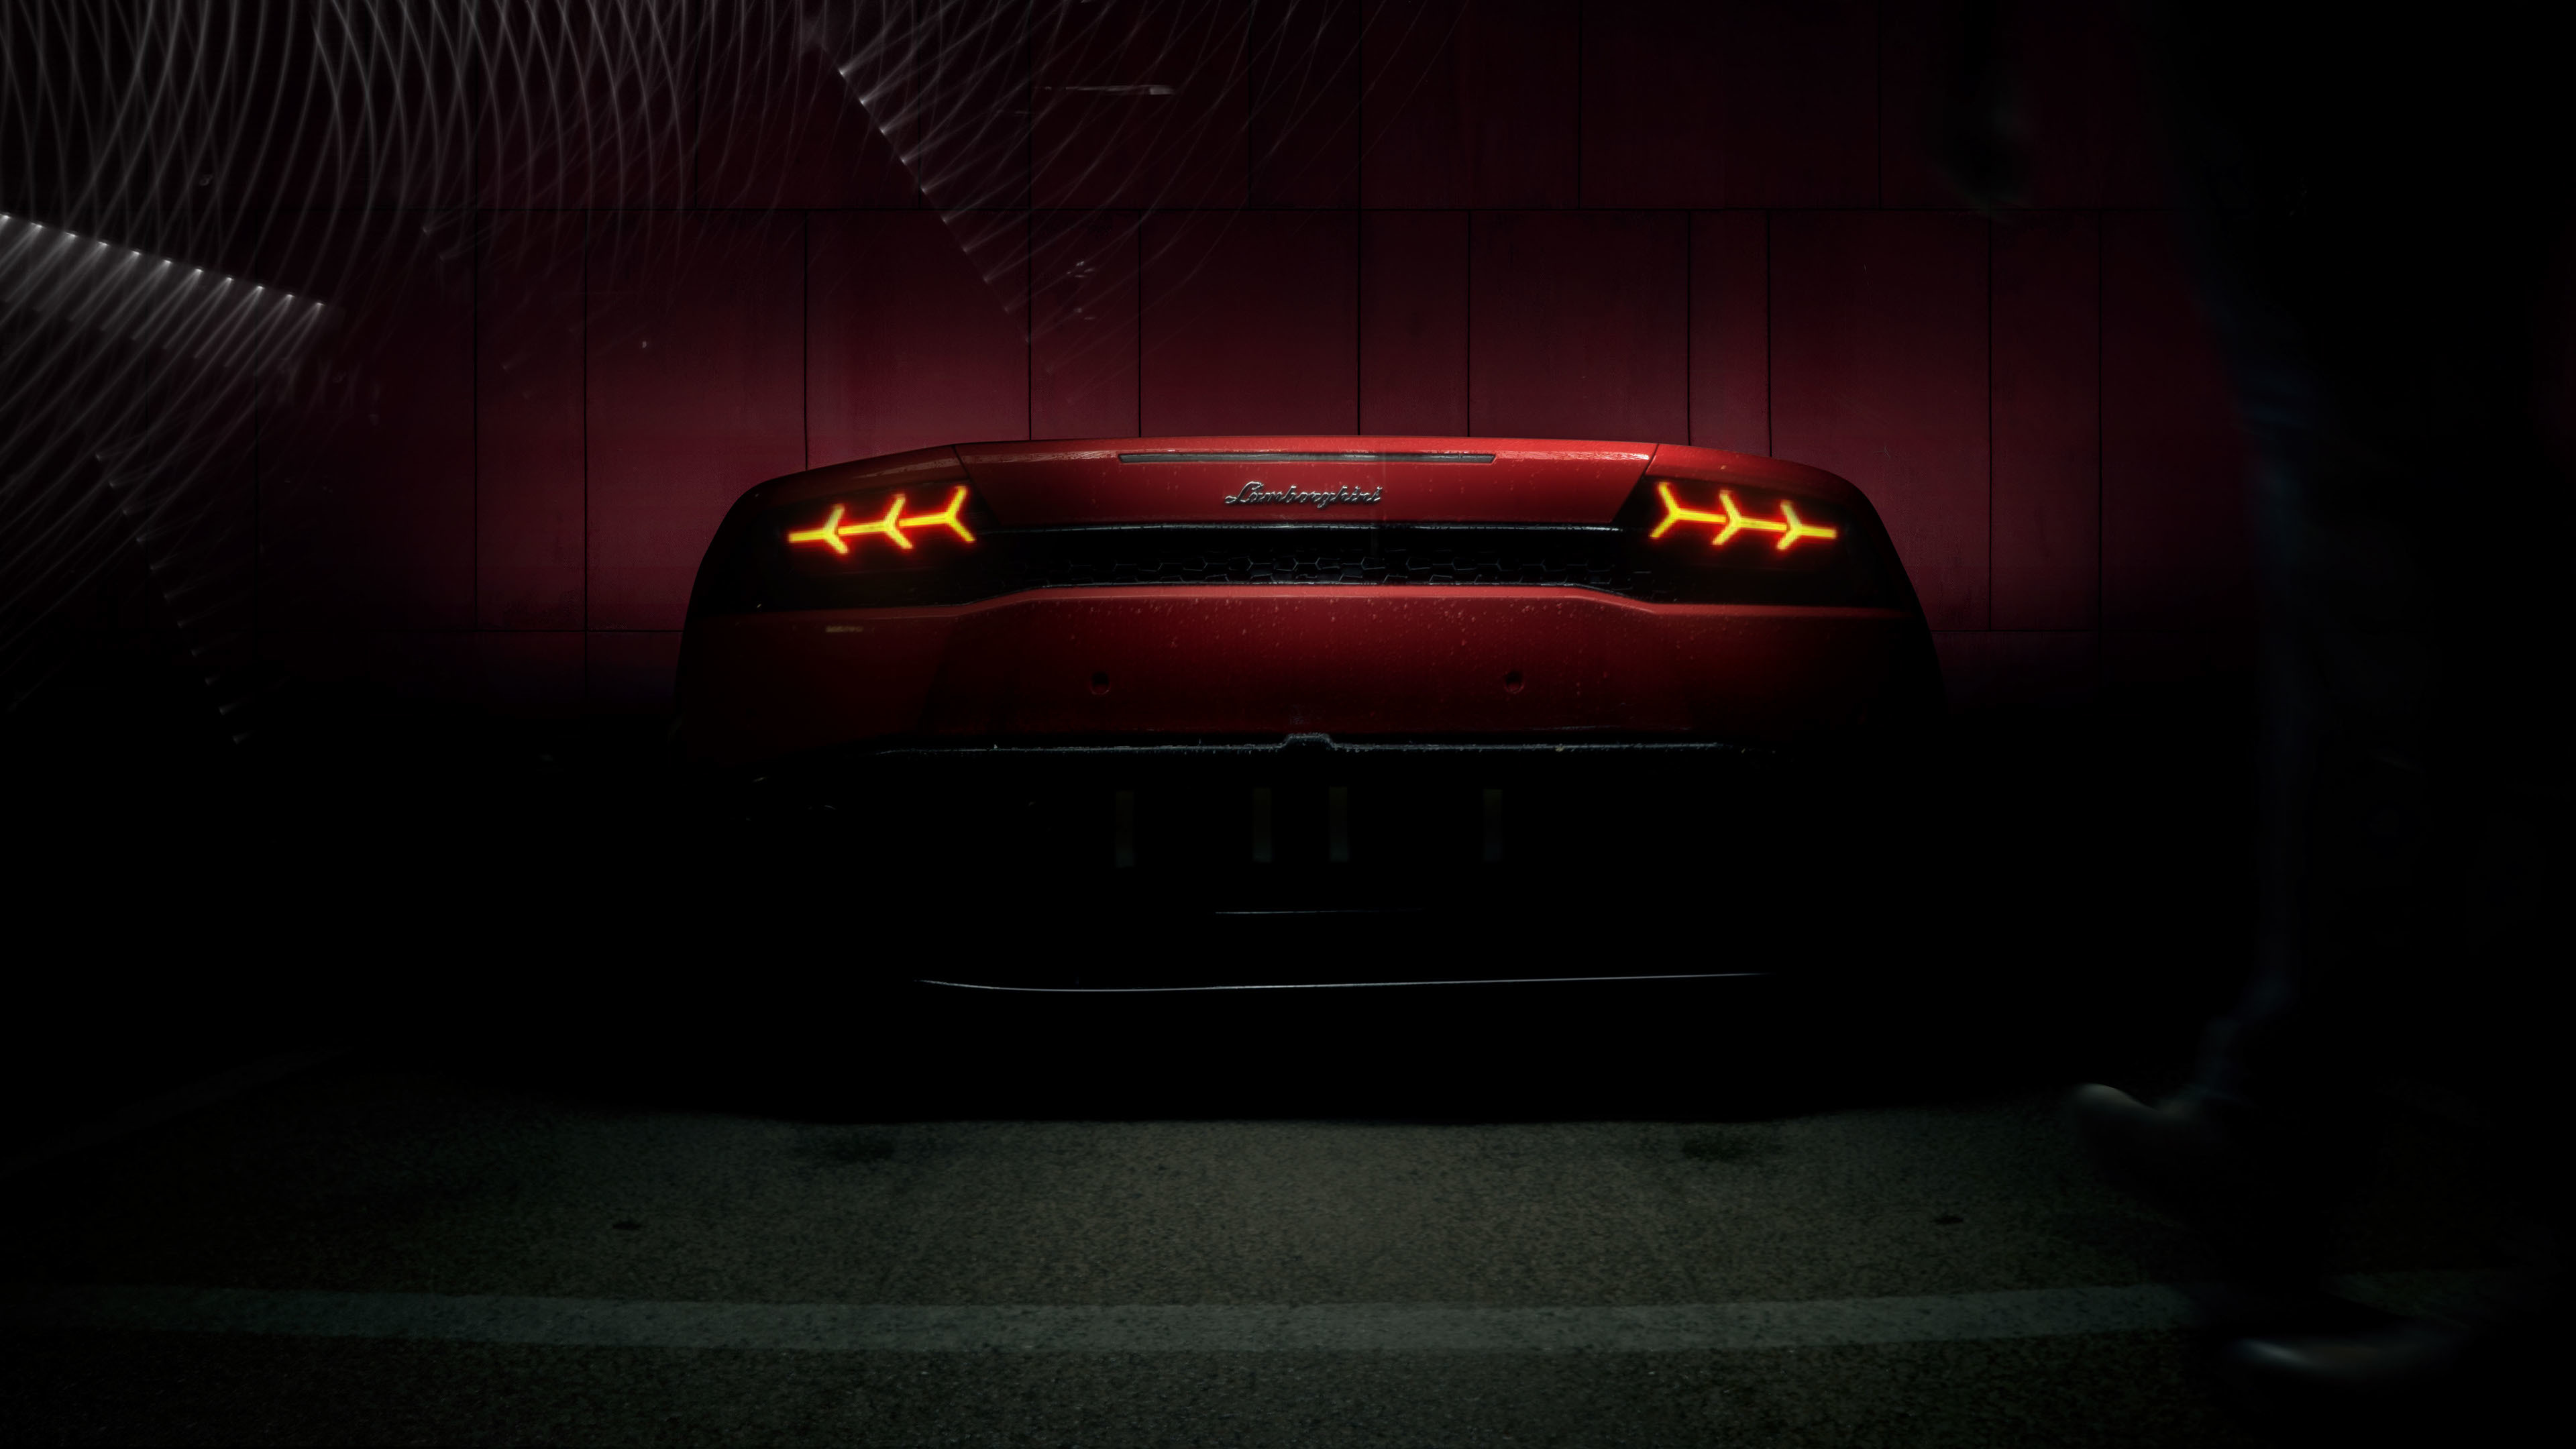 red lamborghini huracan rear lights 1539114260 - Red Lamborghini Huracan Rear Lights - lamborghini wallpapers, lamborghini huracan wallpapers, hd-wallpapers, cars wallpapers, behance wallpapers, artist wallpapers, 4k-wallpapers